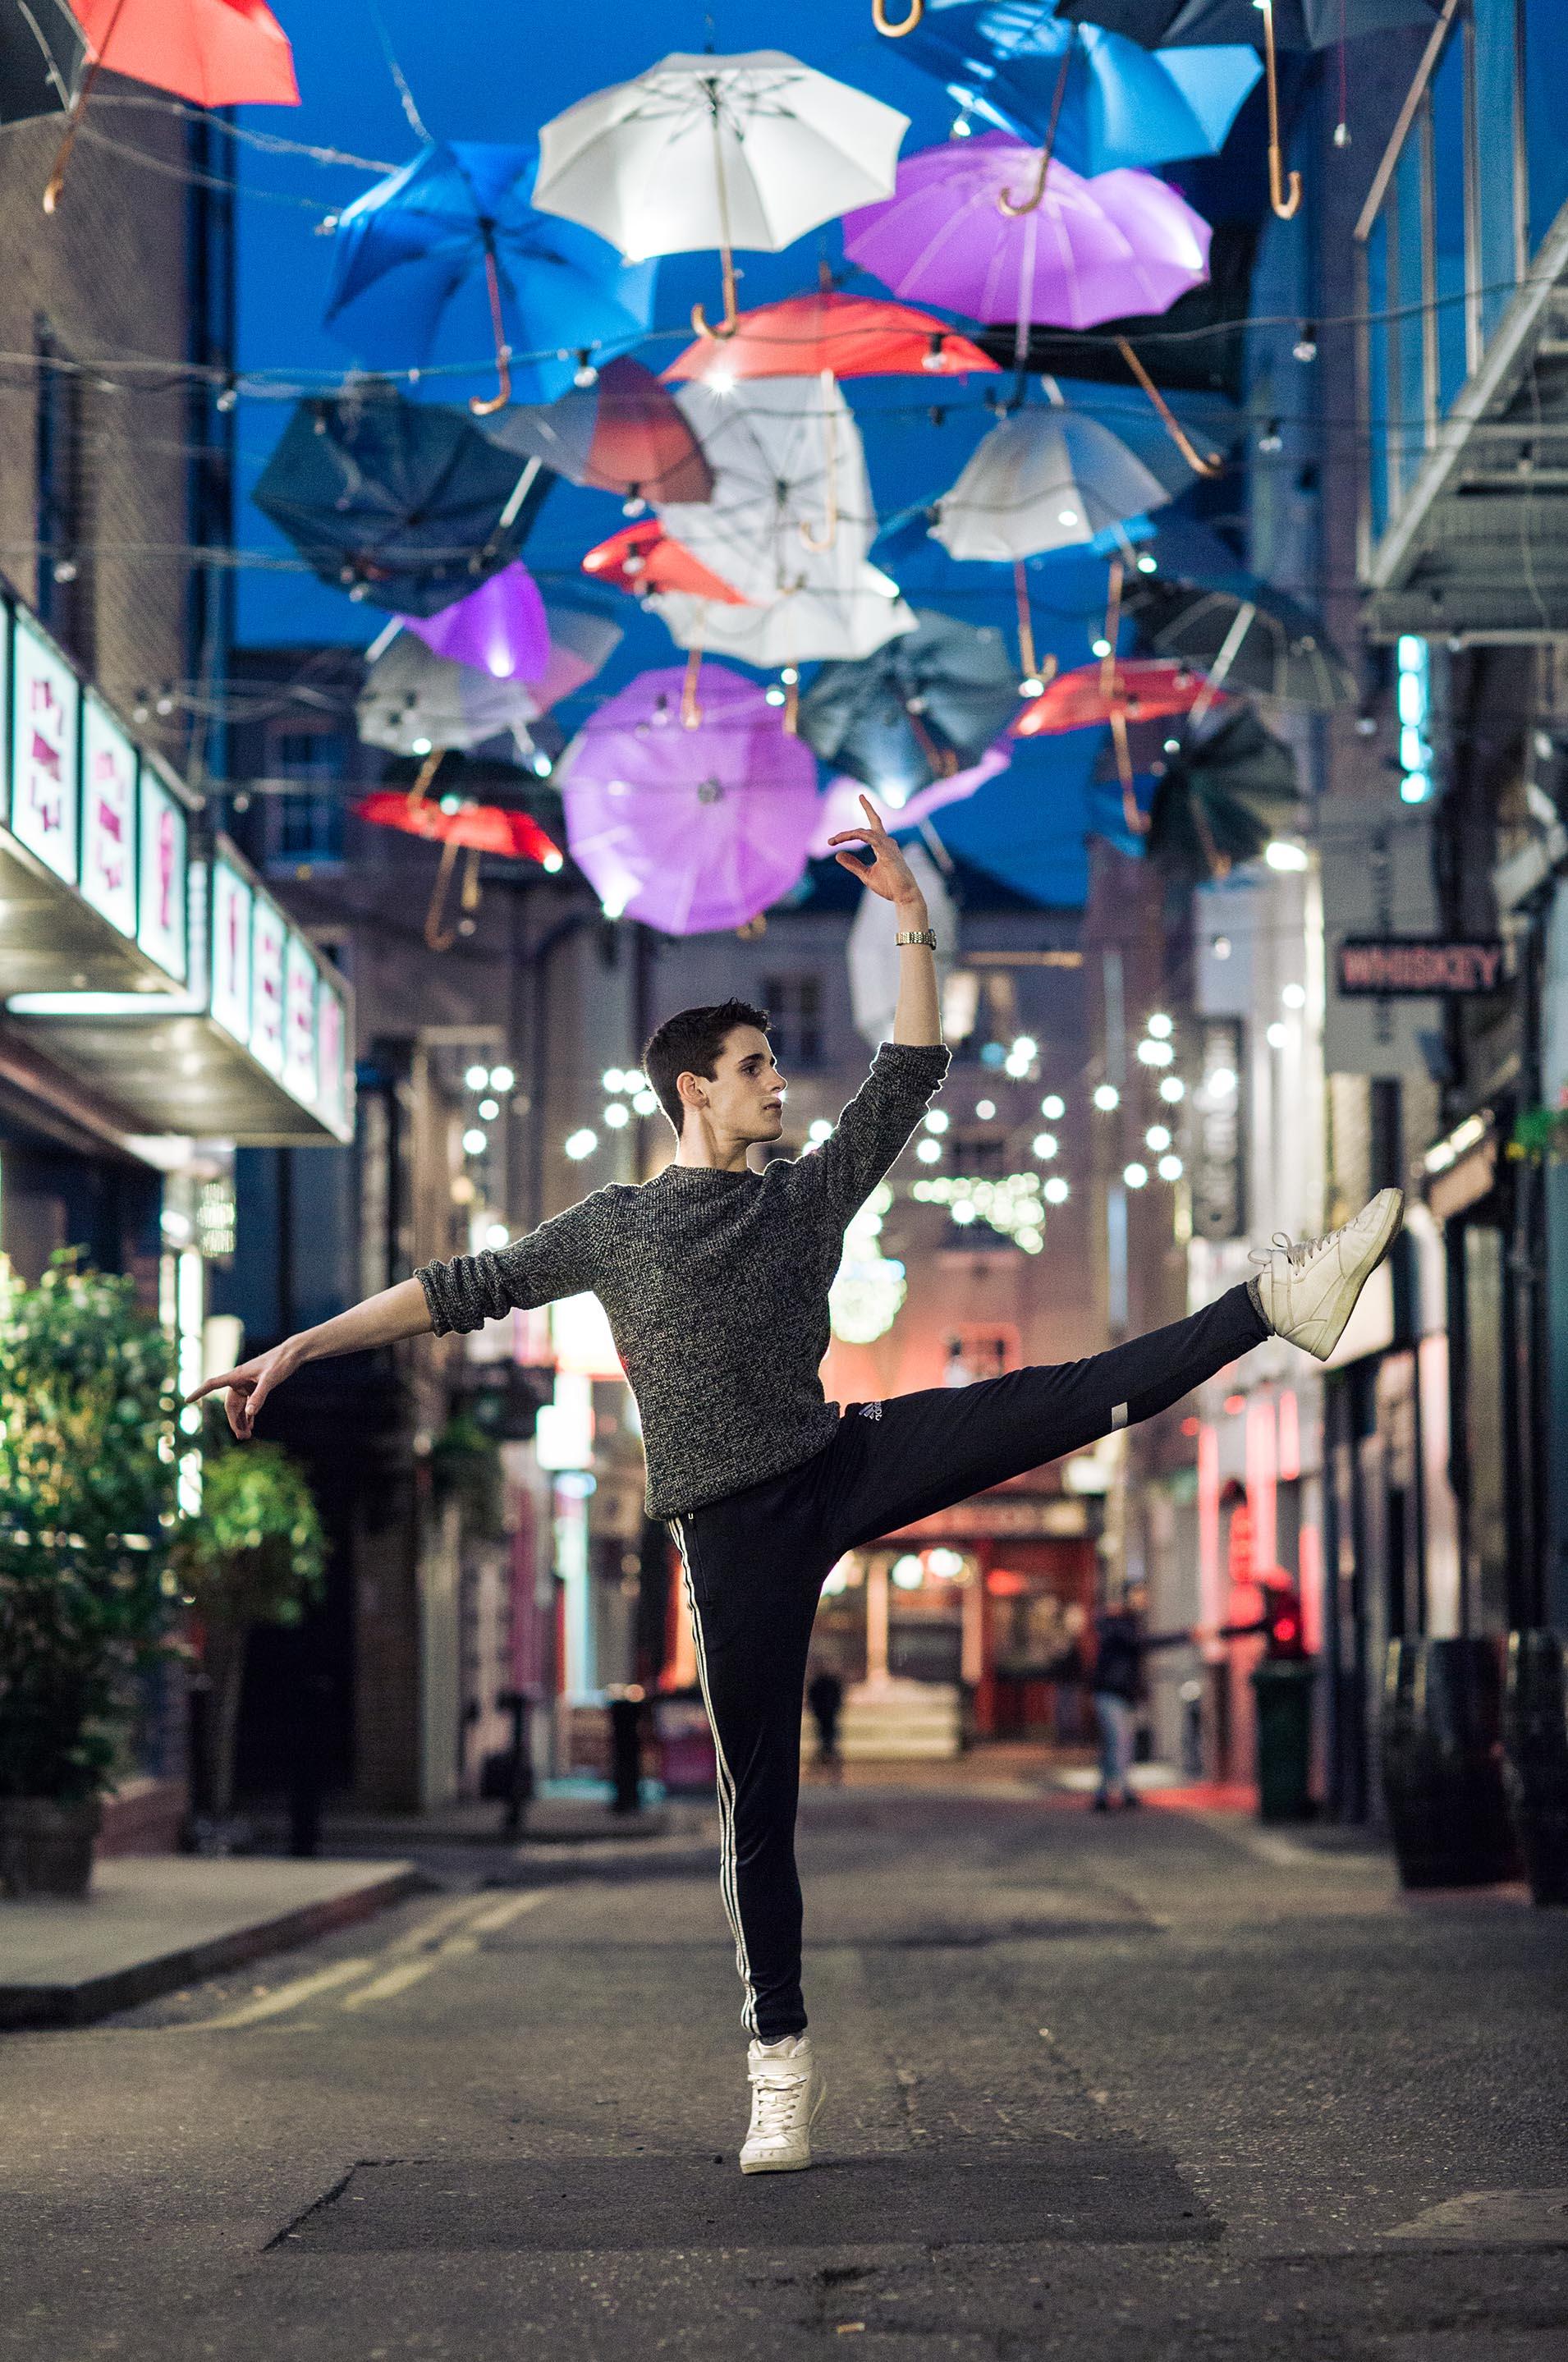 Dublin Ballet Project image 4